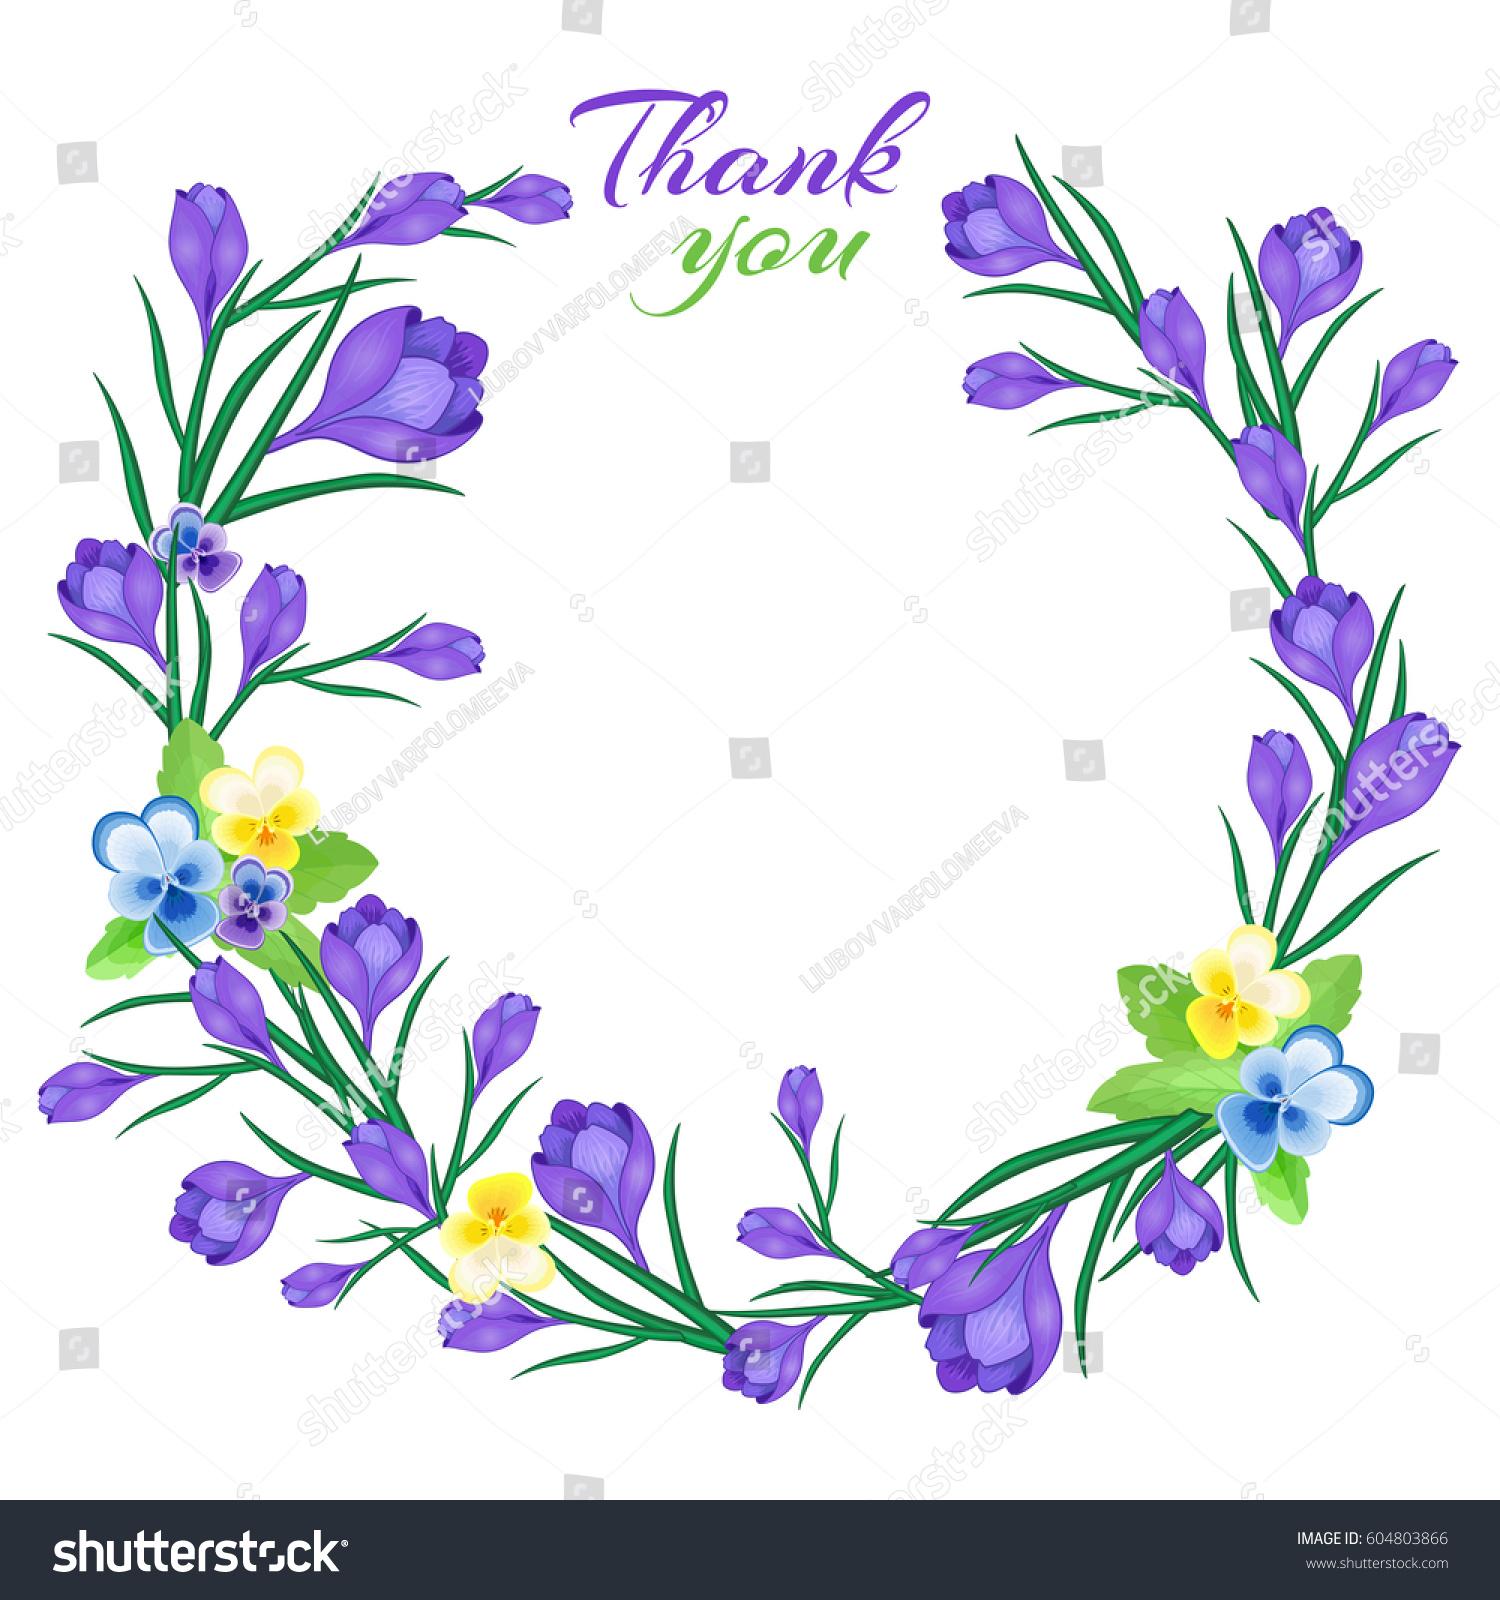 Royalty Free Stock Illustration Of Thank You Illustration Greeting